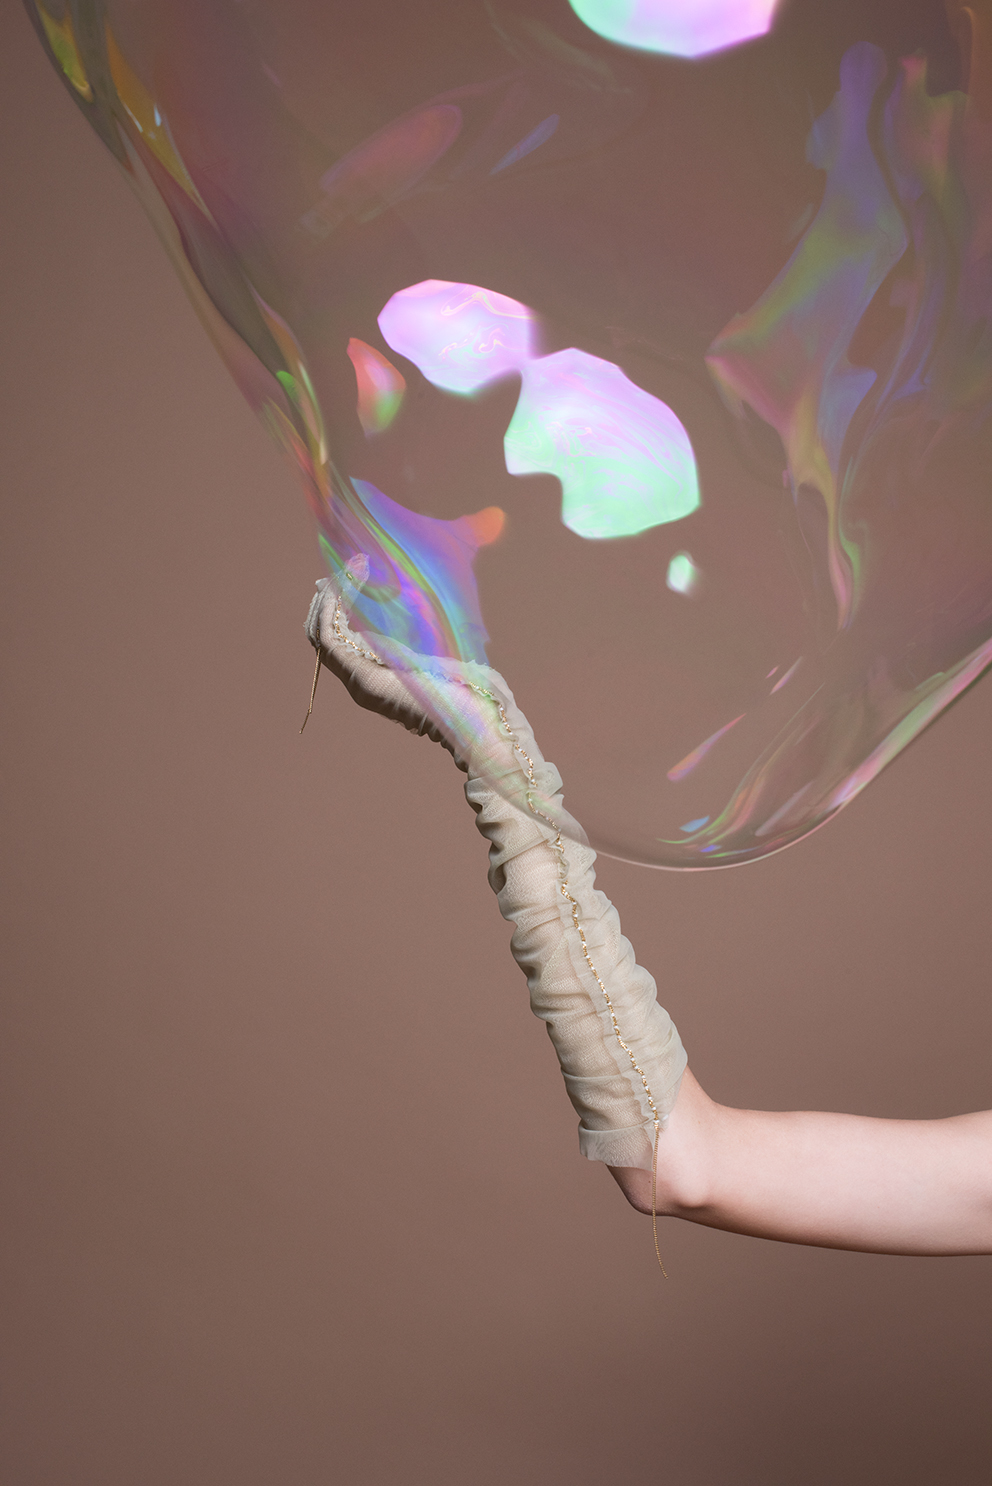 imke-panhuijzen-the-golden-bubble-10-lr.jpg